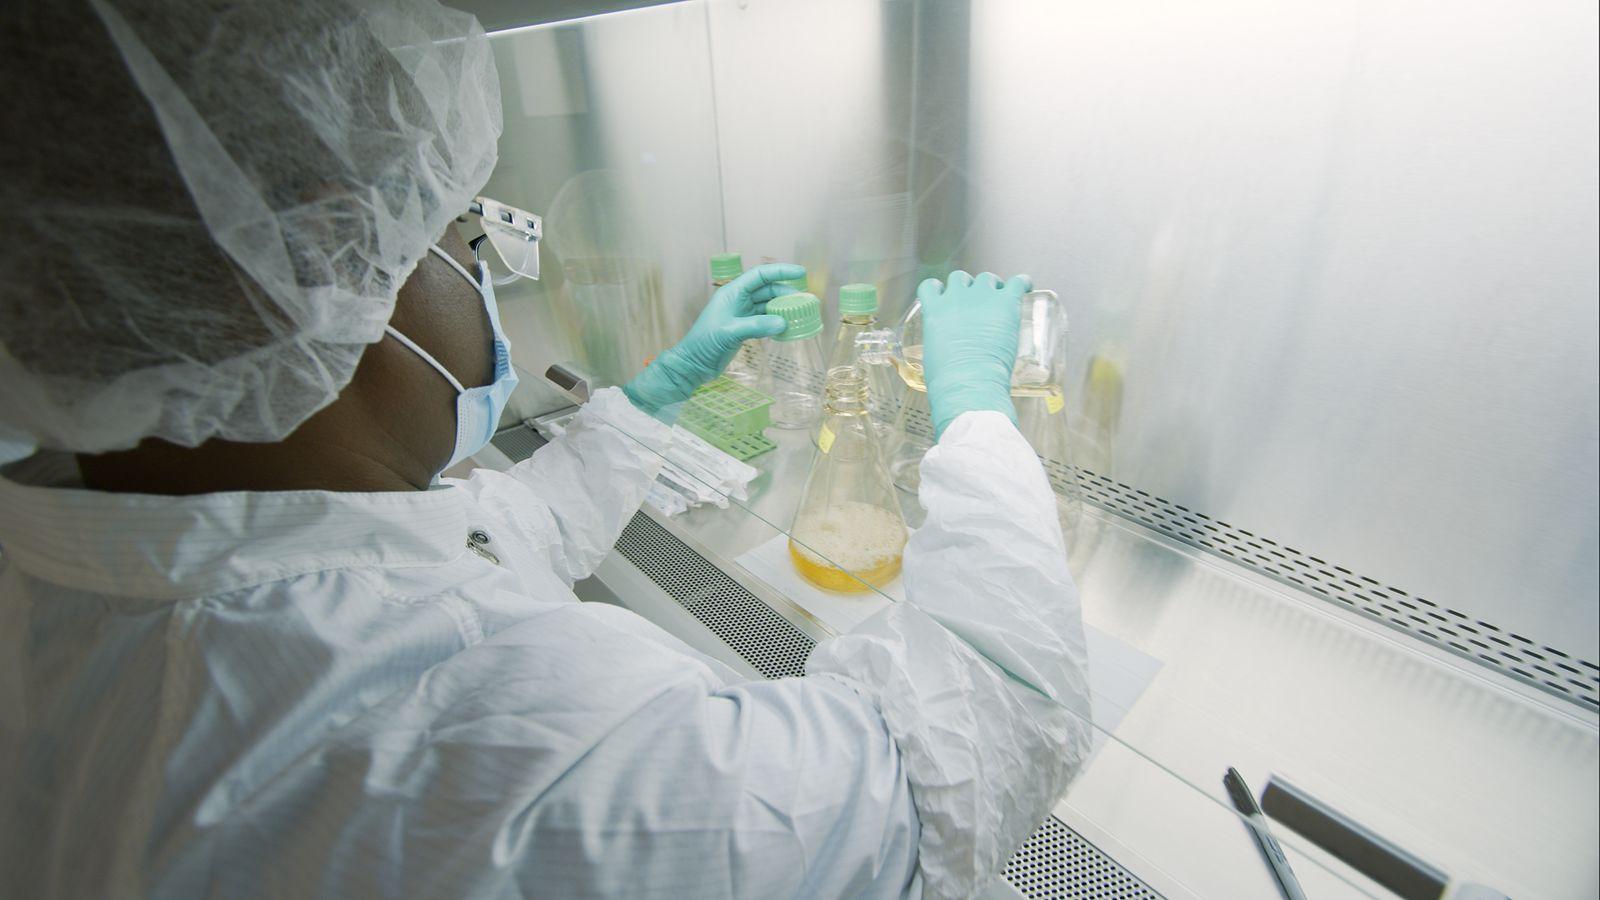 Llly Pharma - Operator manipulating the antibody's nutrient media